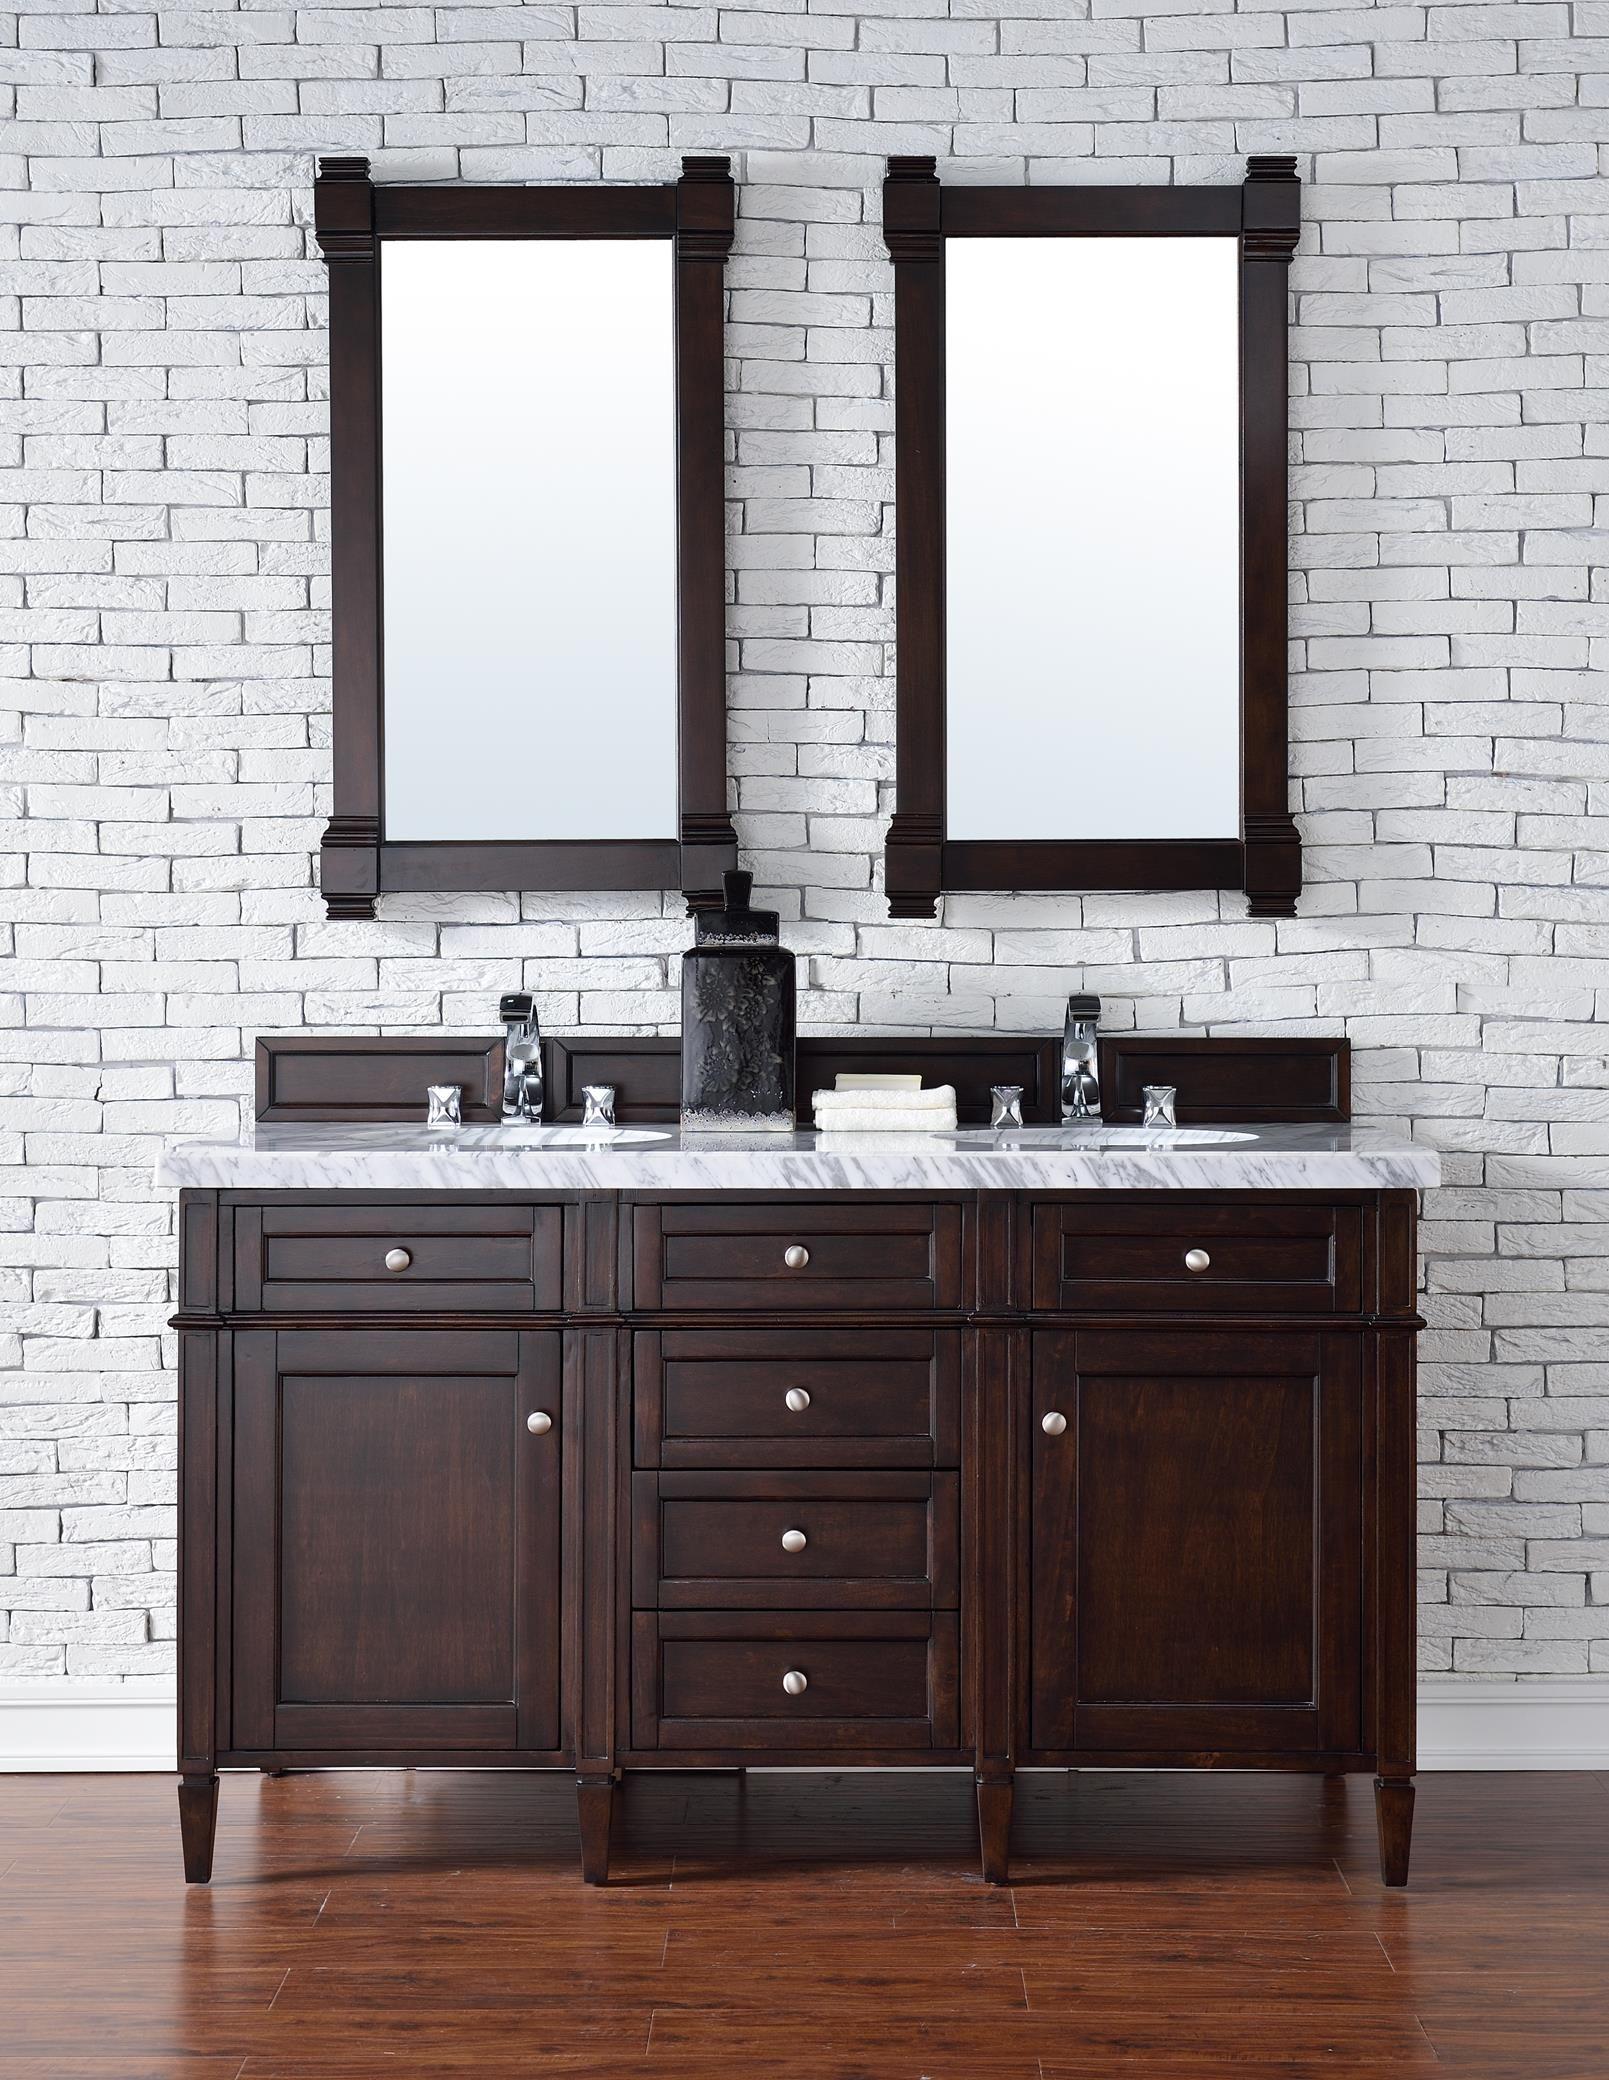 brittany 60 double sink bathroom vanity cabinet burnished rh pinterest co uk Oak Bathroom Vanity Cabinets Rustic Country Style Bathroom Vanity Cabinets